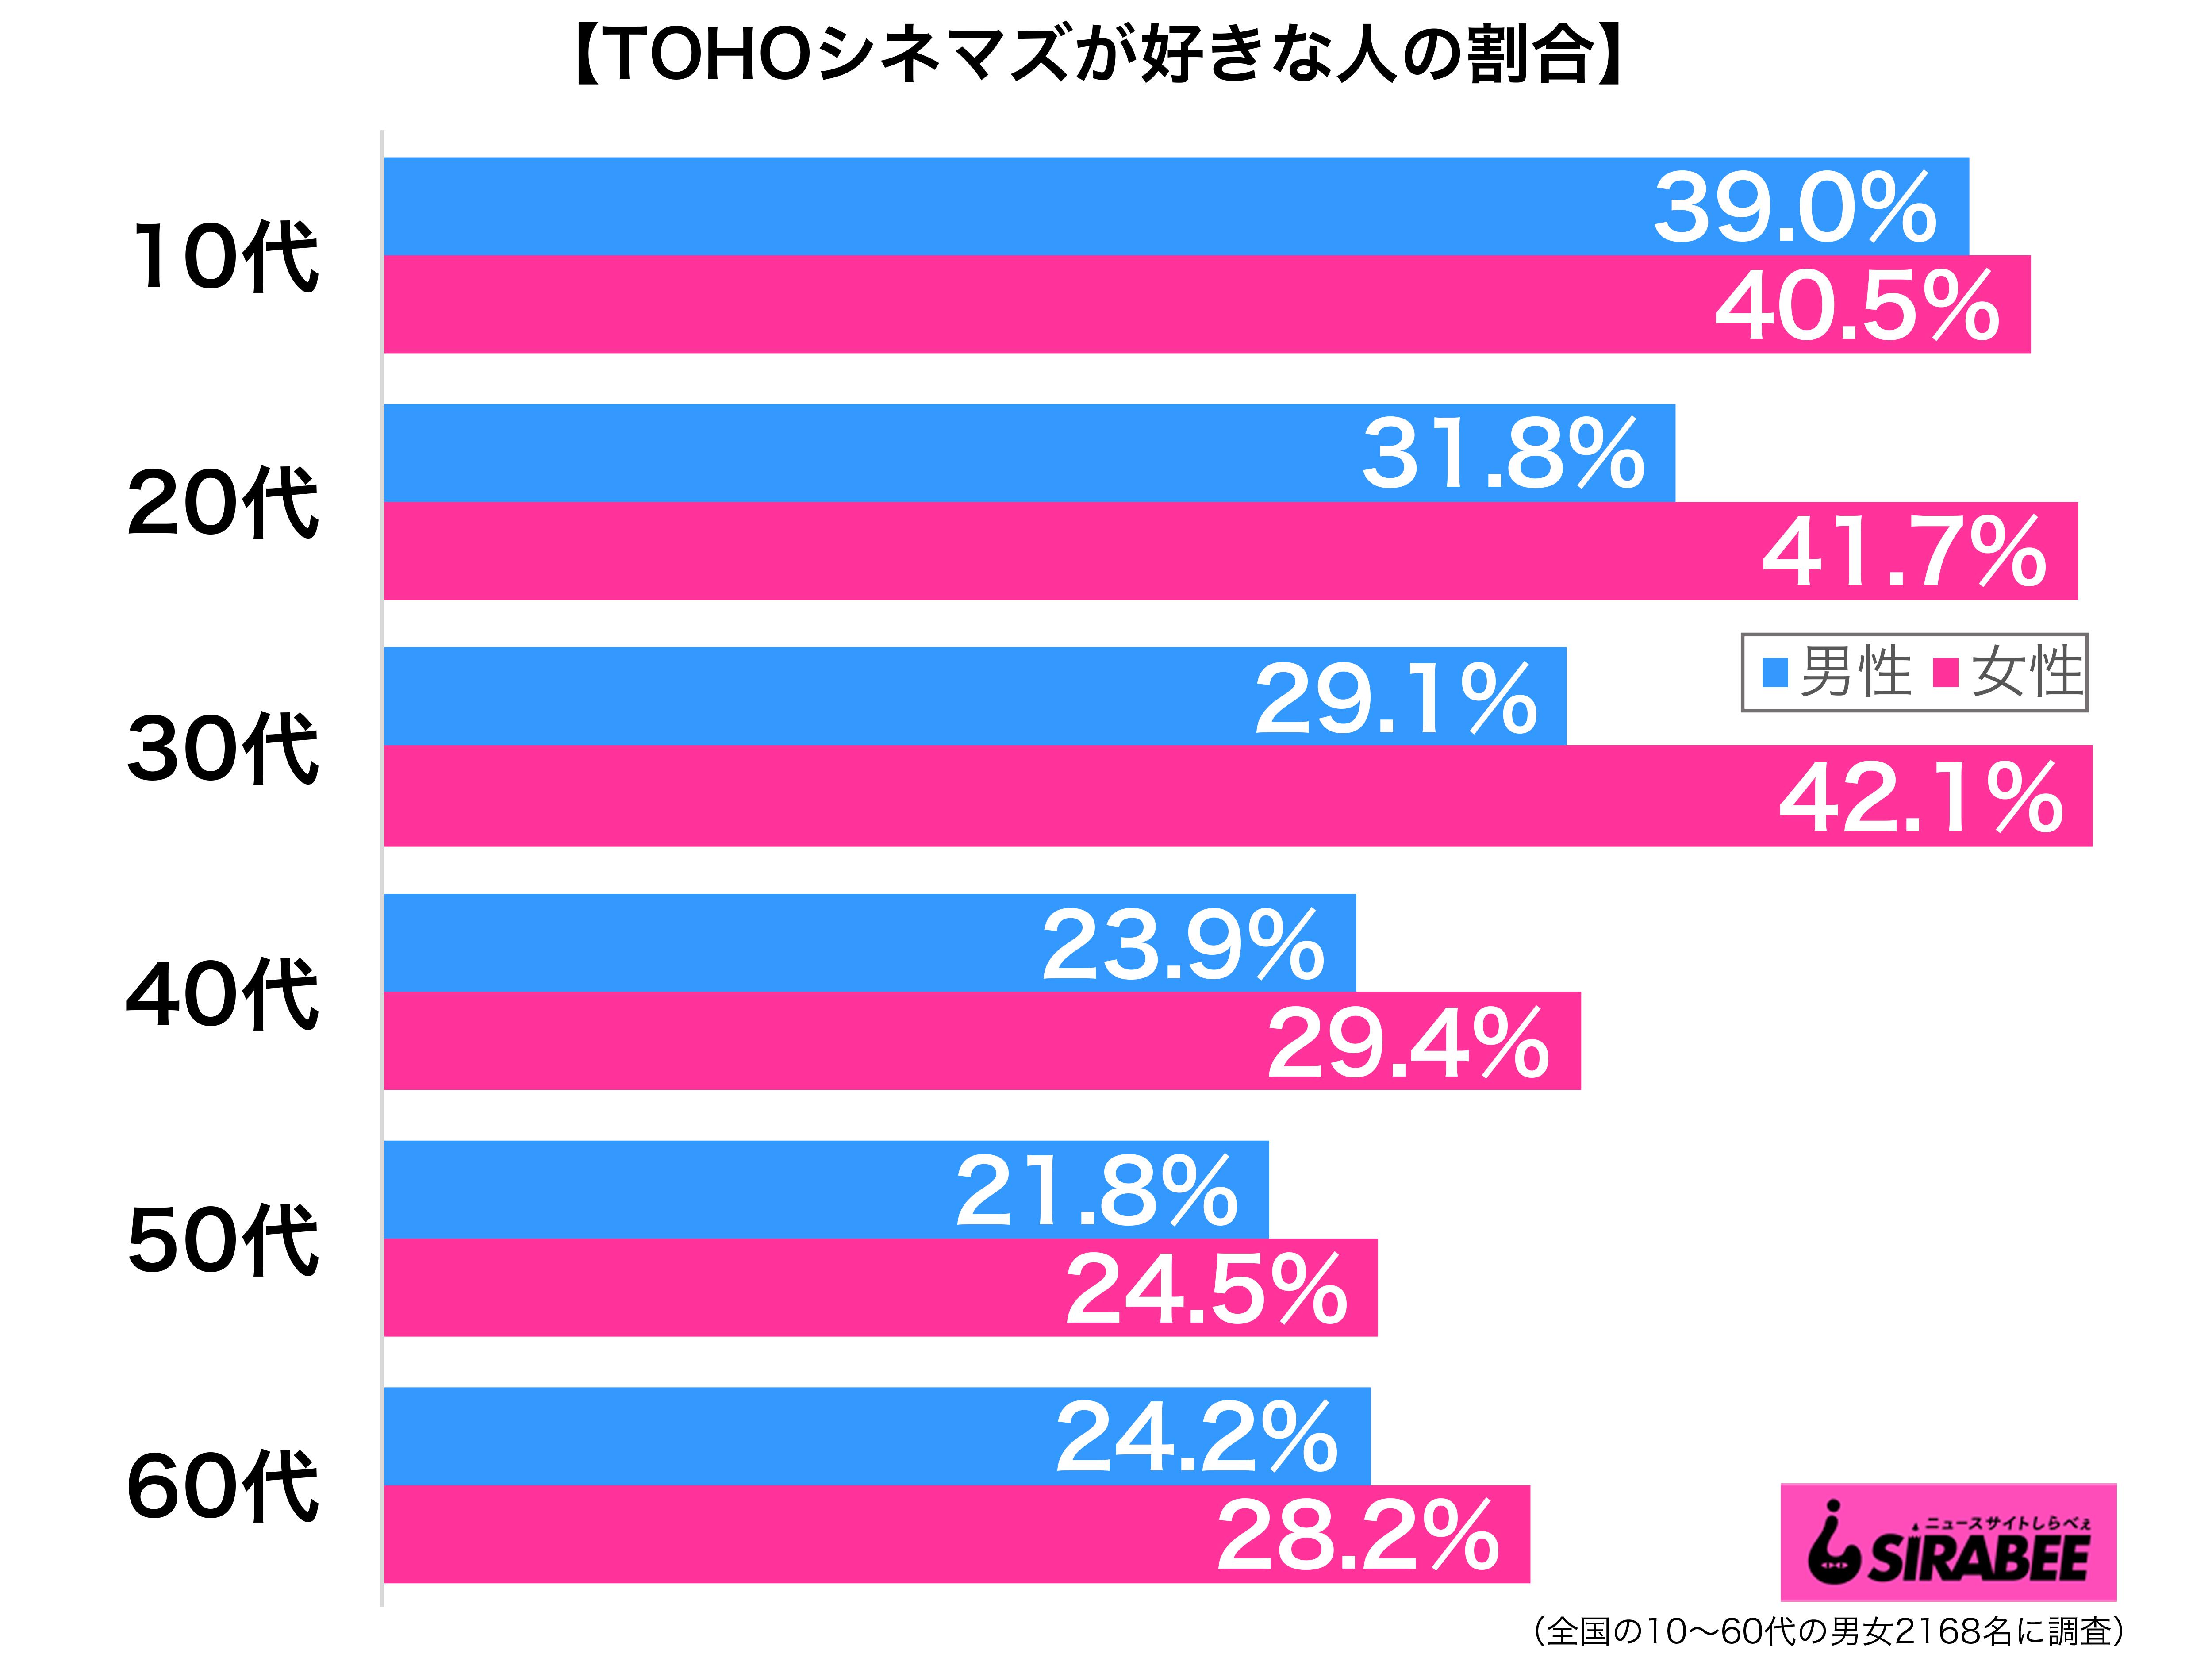 TOHOシネマズが好き性年代別グラフ